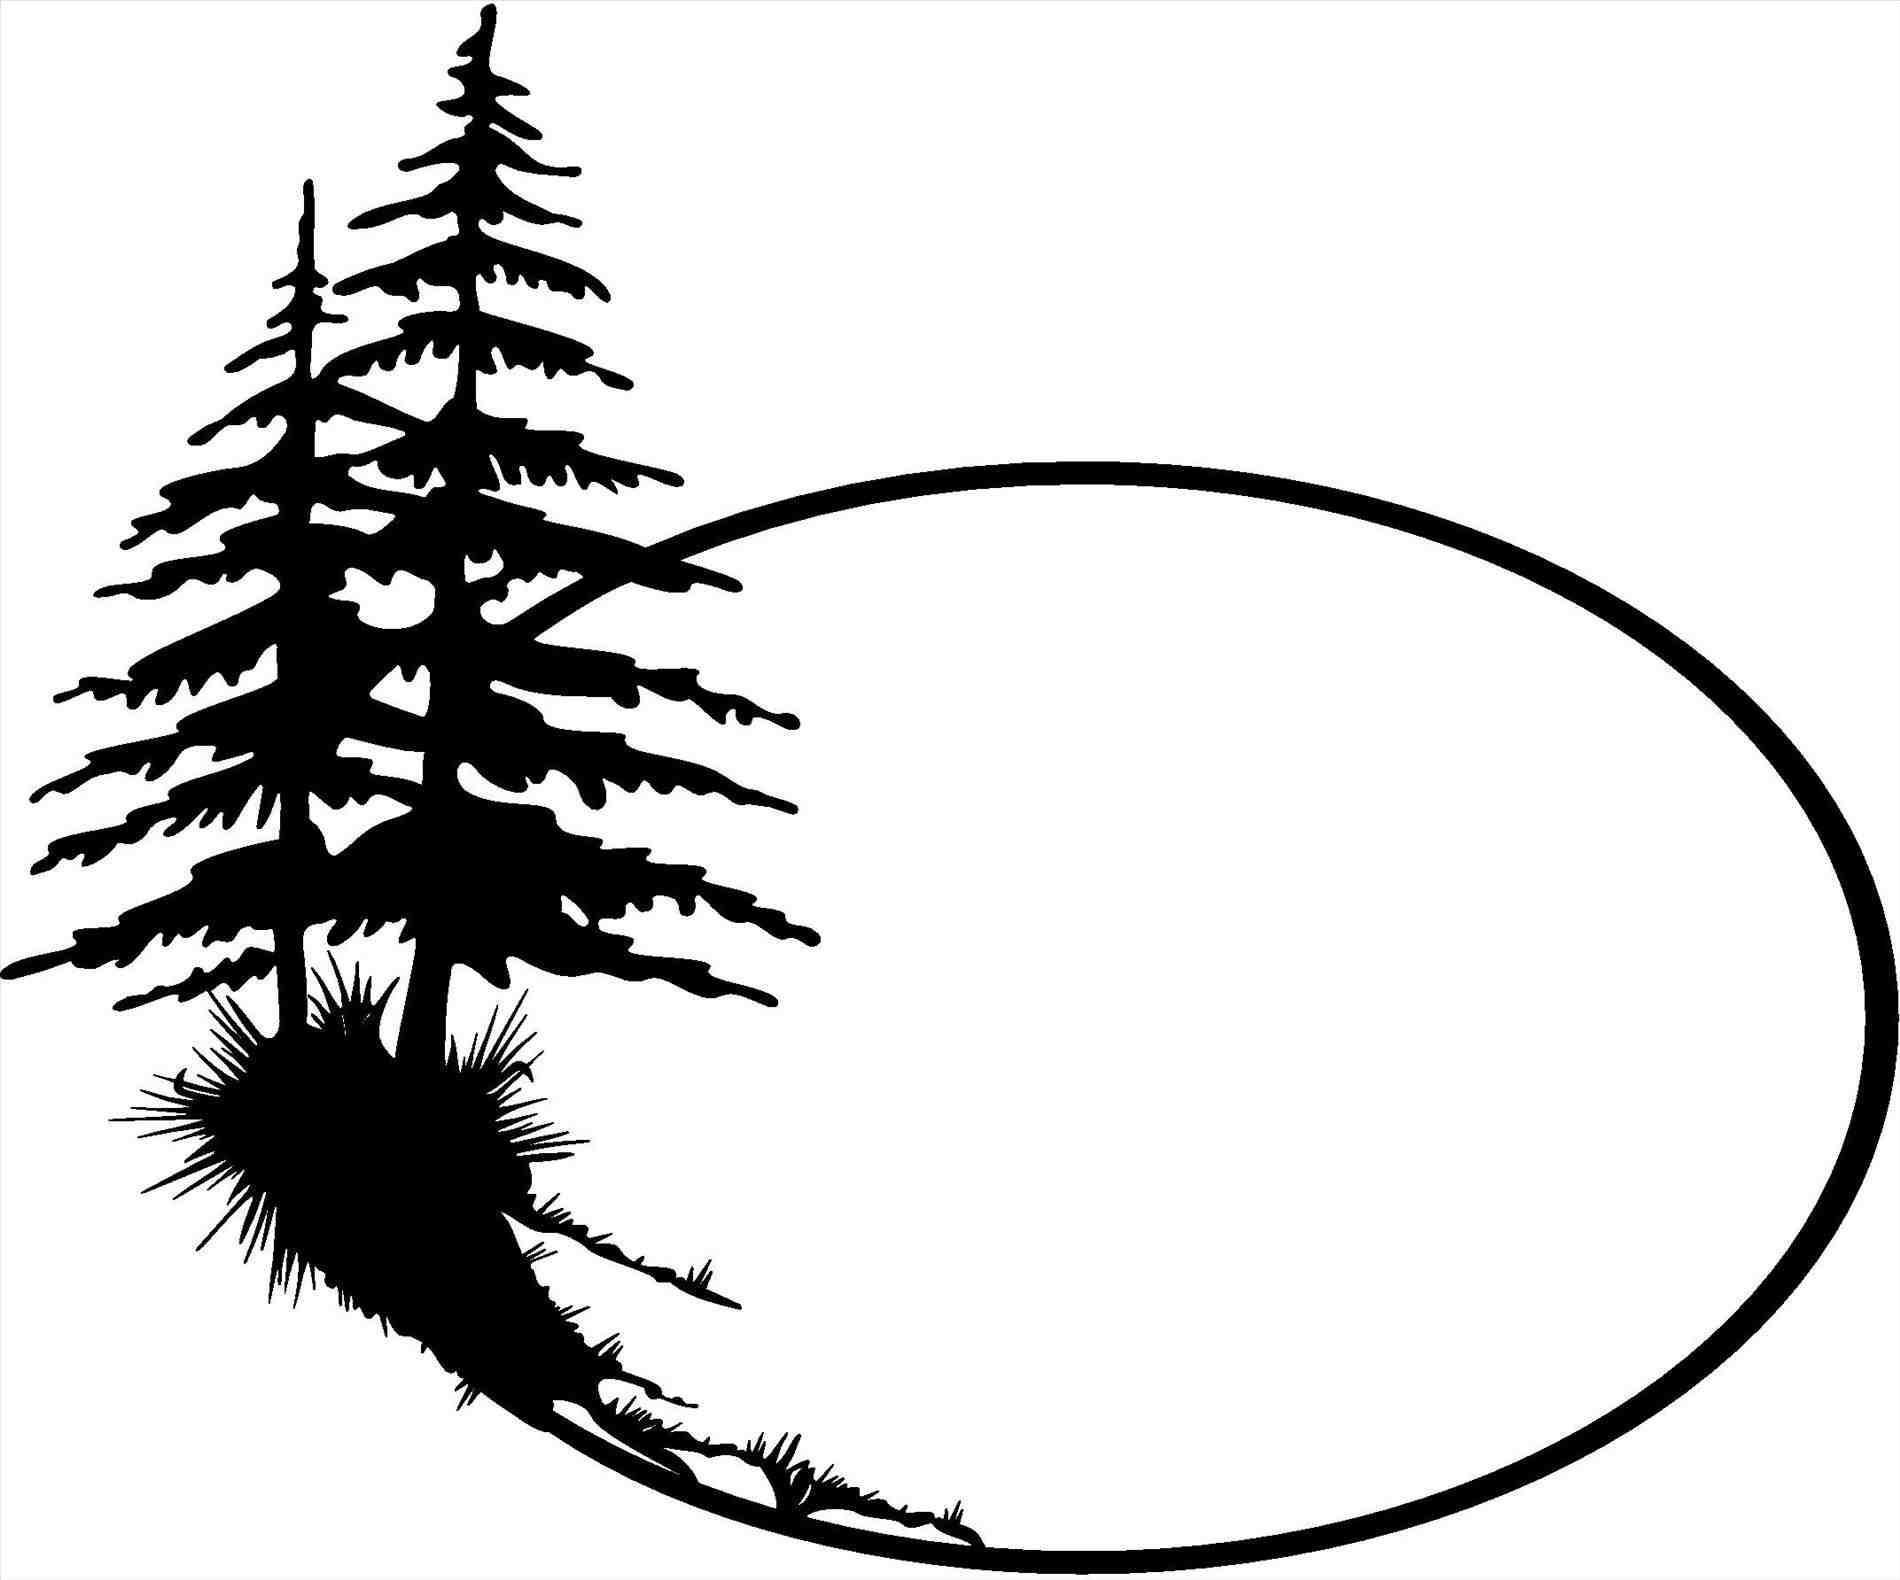 1900x1580 Christmas Tree Silhouette Clip Art Cheminee.website